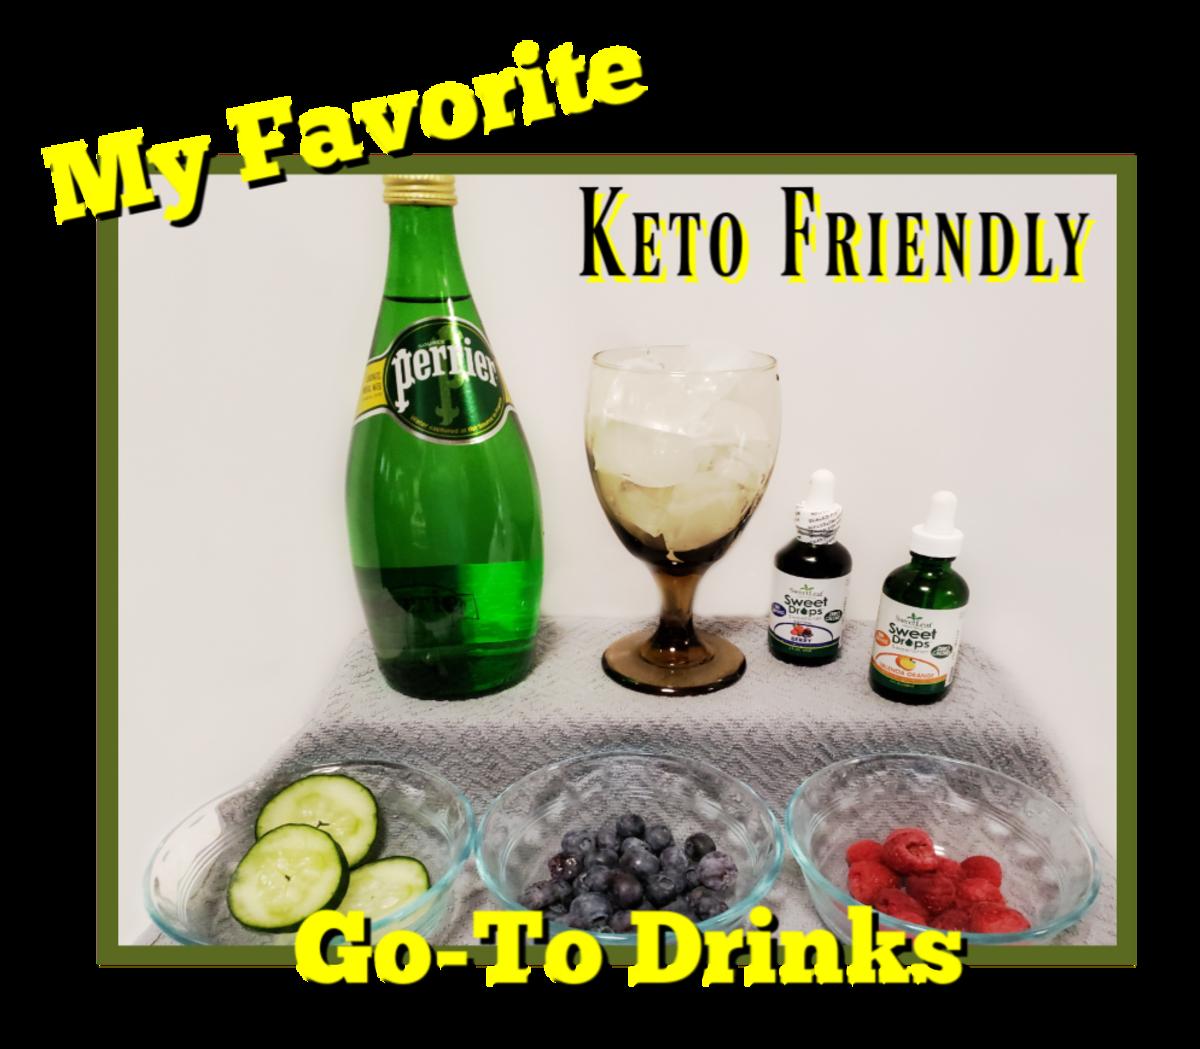 My Favorite Keto Go-To Drinks